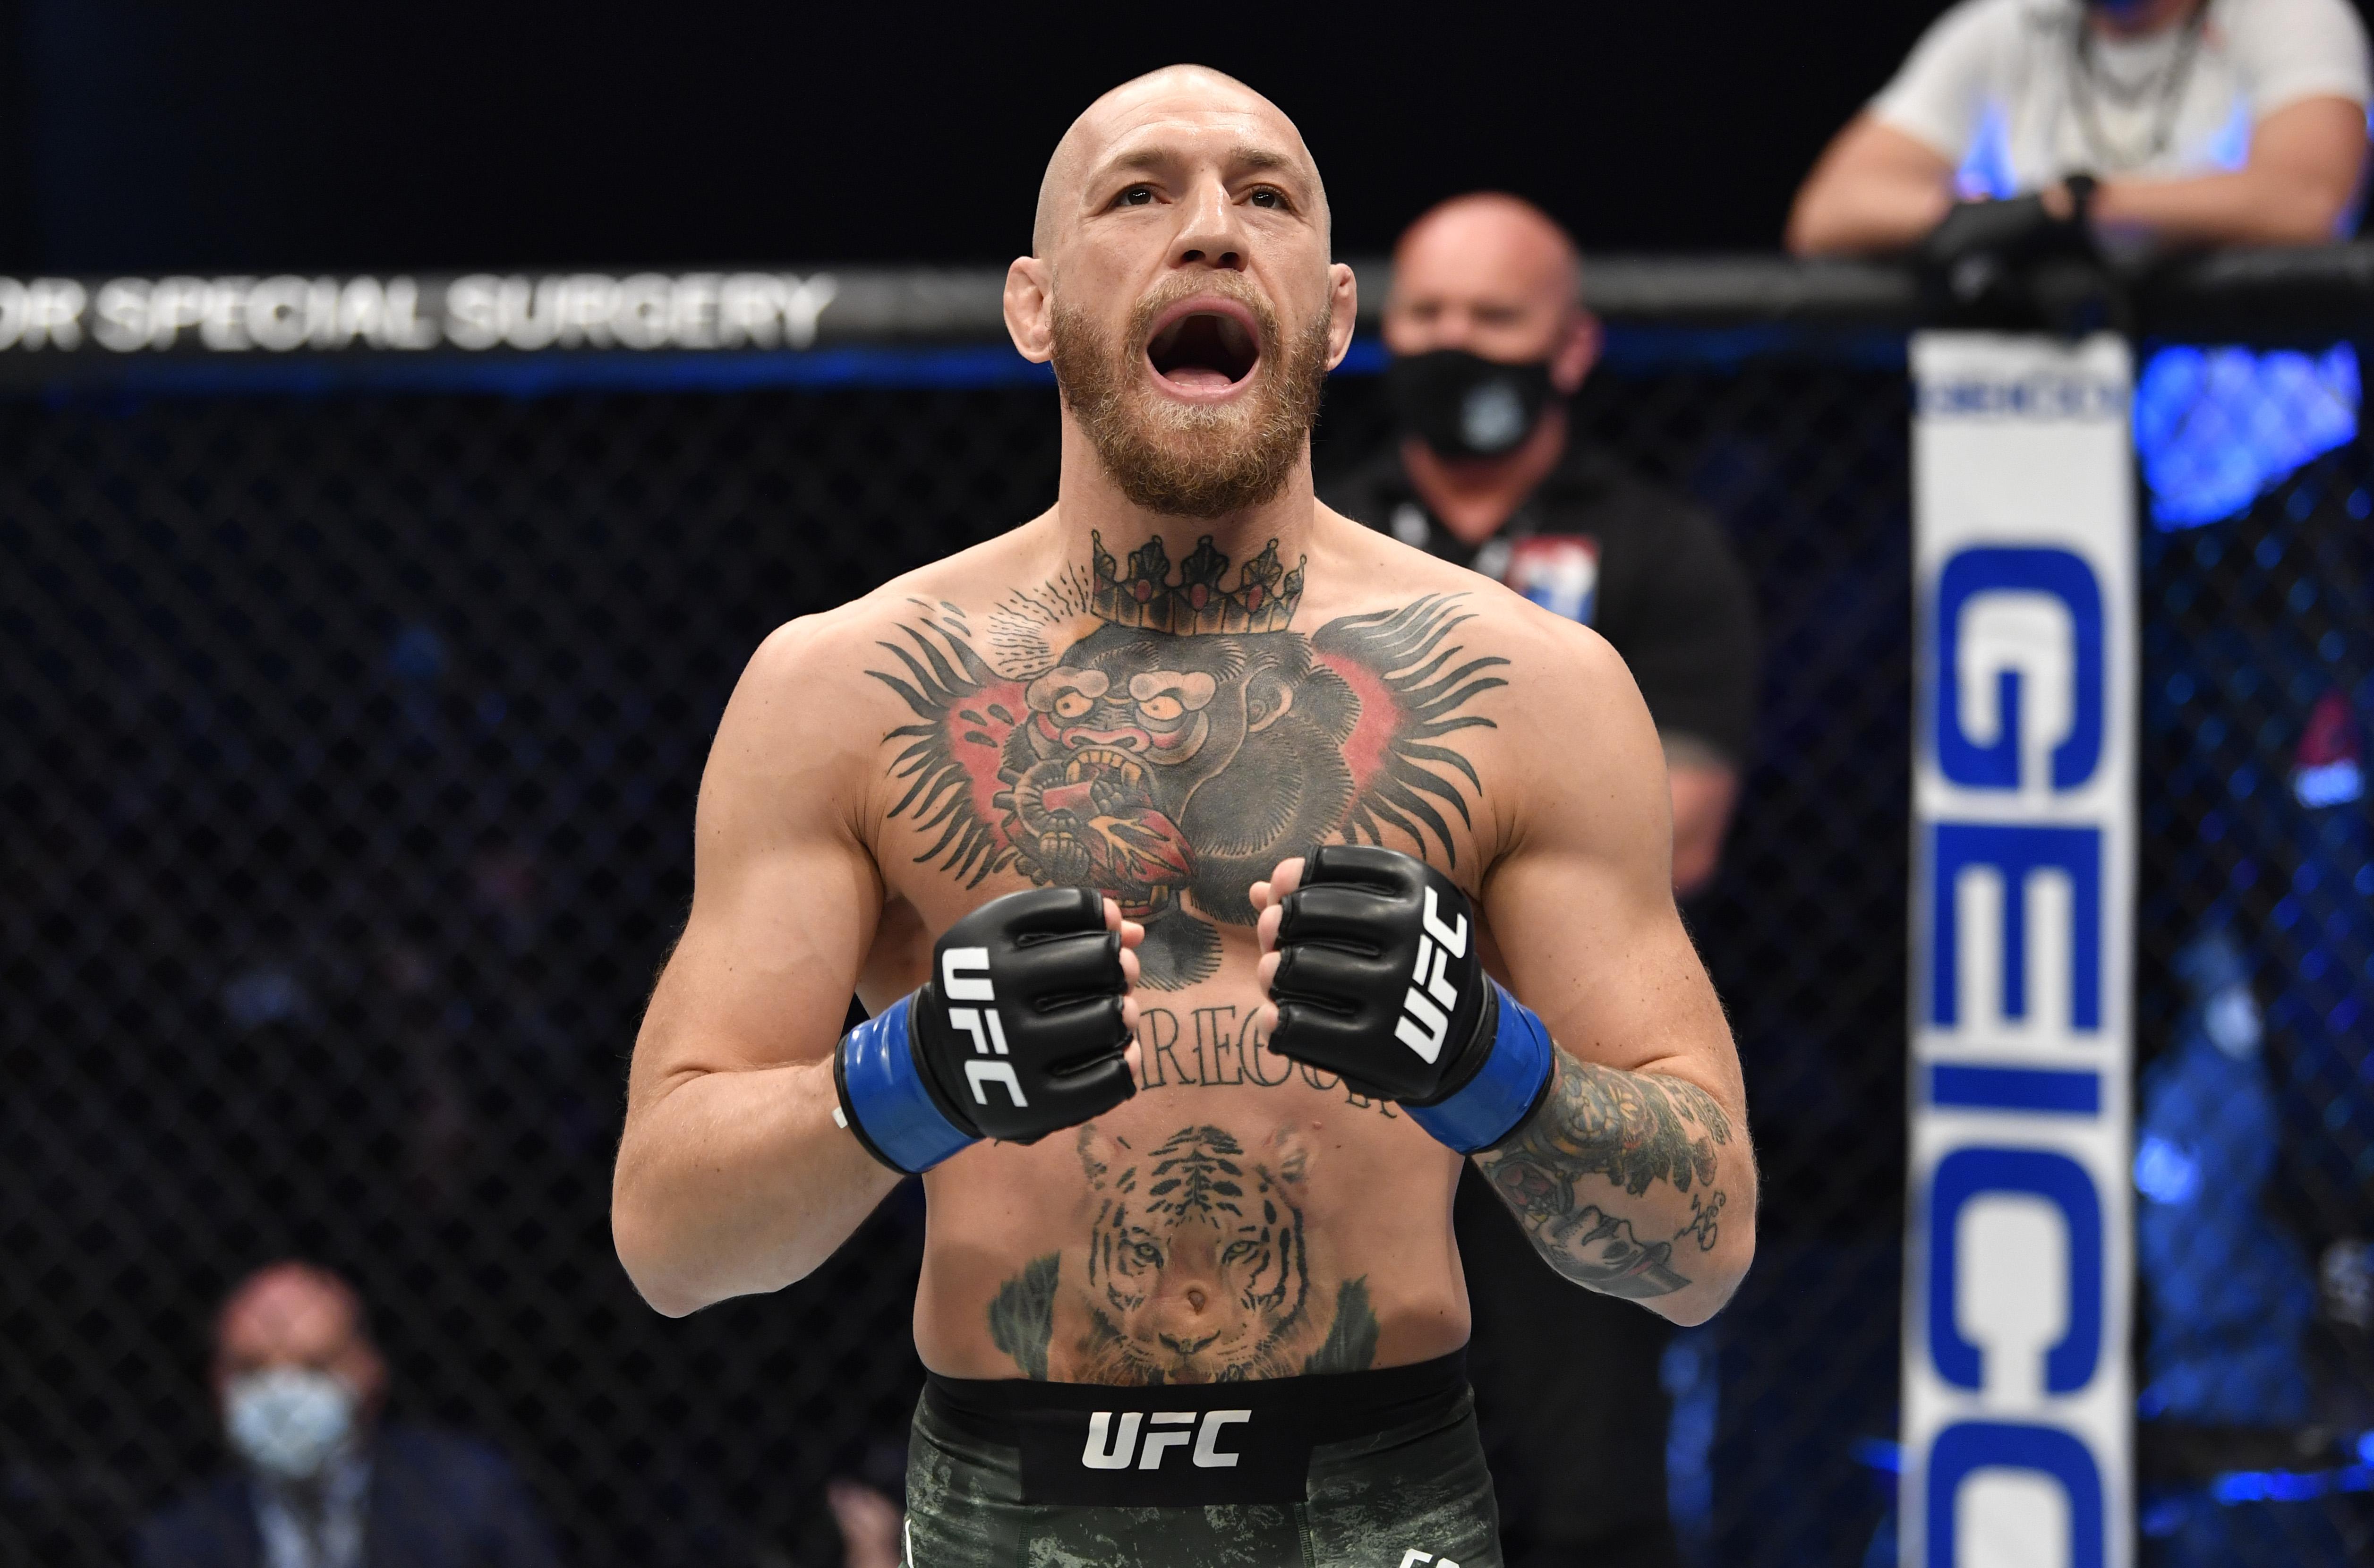 UFC 257: Dustin Poirier v Conor McGregor